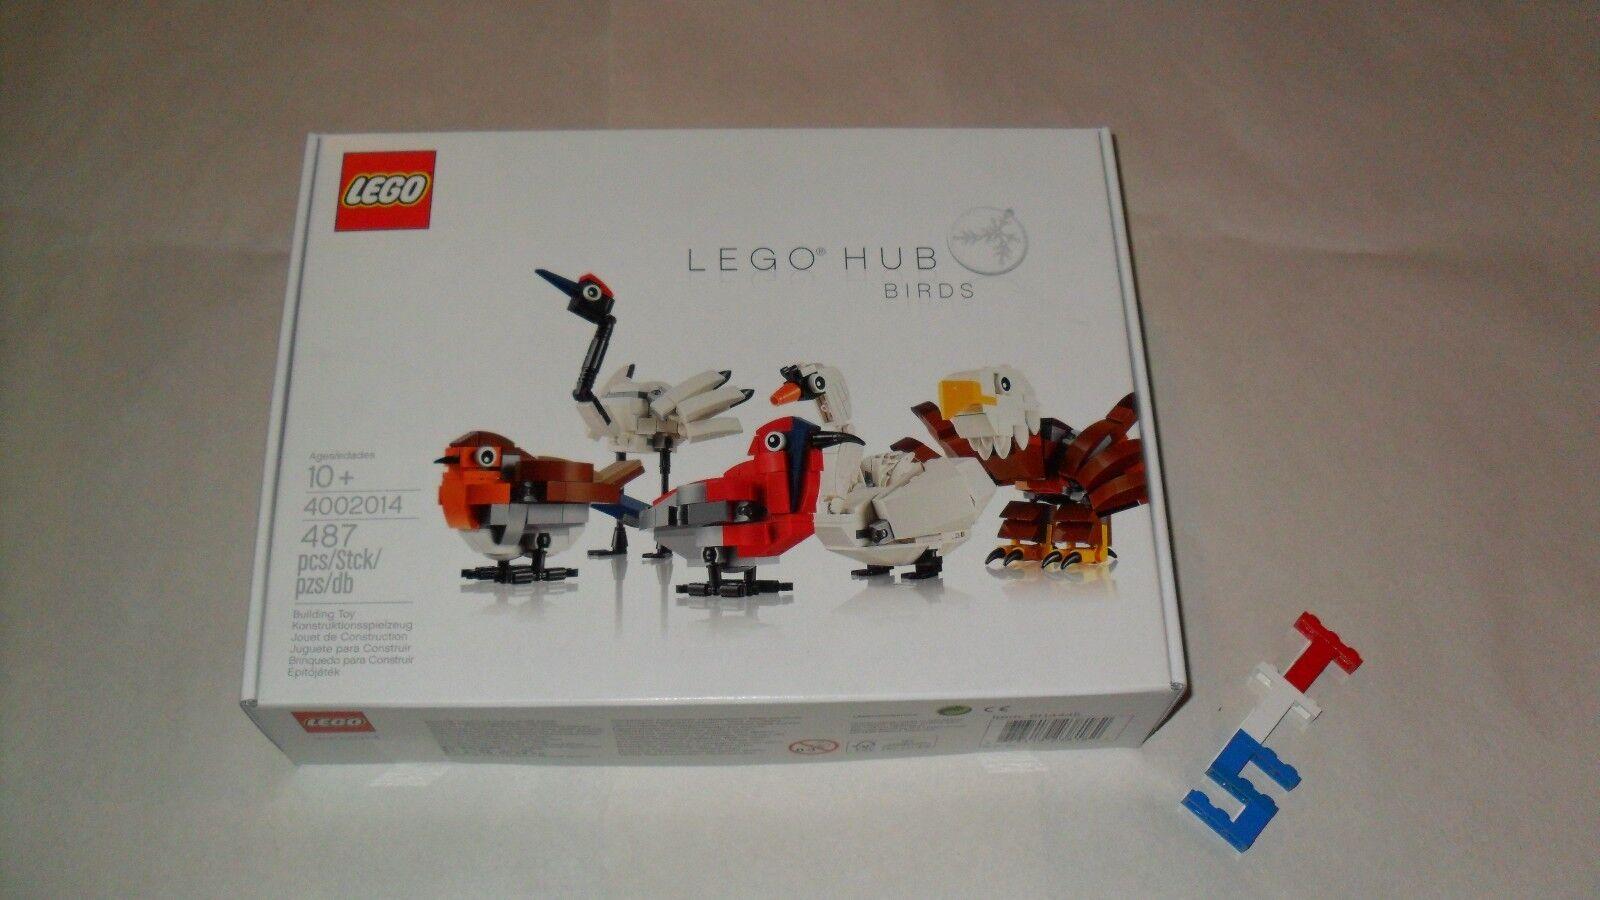 nouveau Sealed Lego 4002014 HUB Birds Exclusive Employee  Gift + Libre Shipping  100% authentique